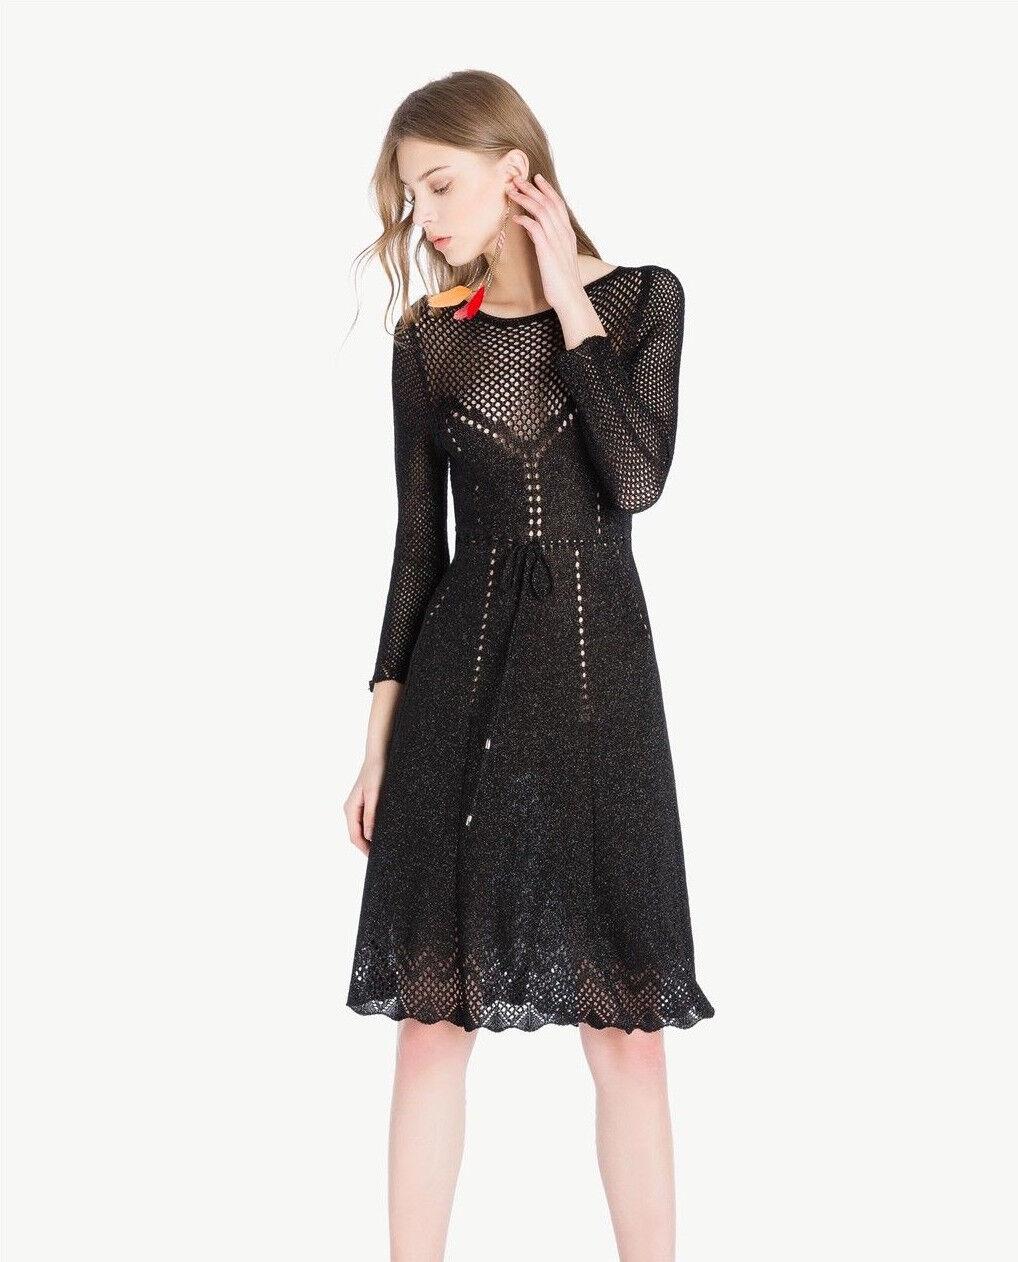 TWINSET NEU Kleid mit Lurex Gr.L black black  Lochmuster  Barbieri Milano